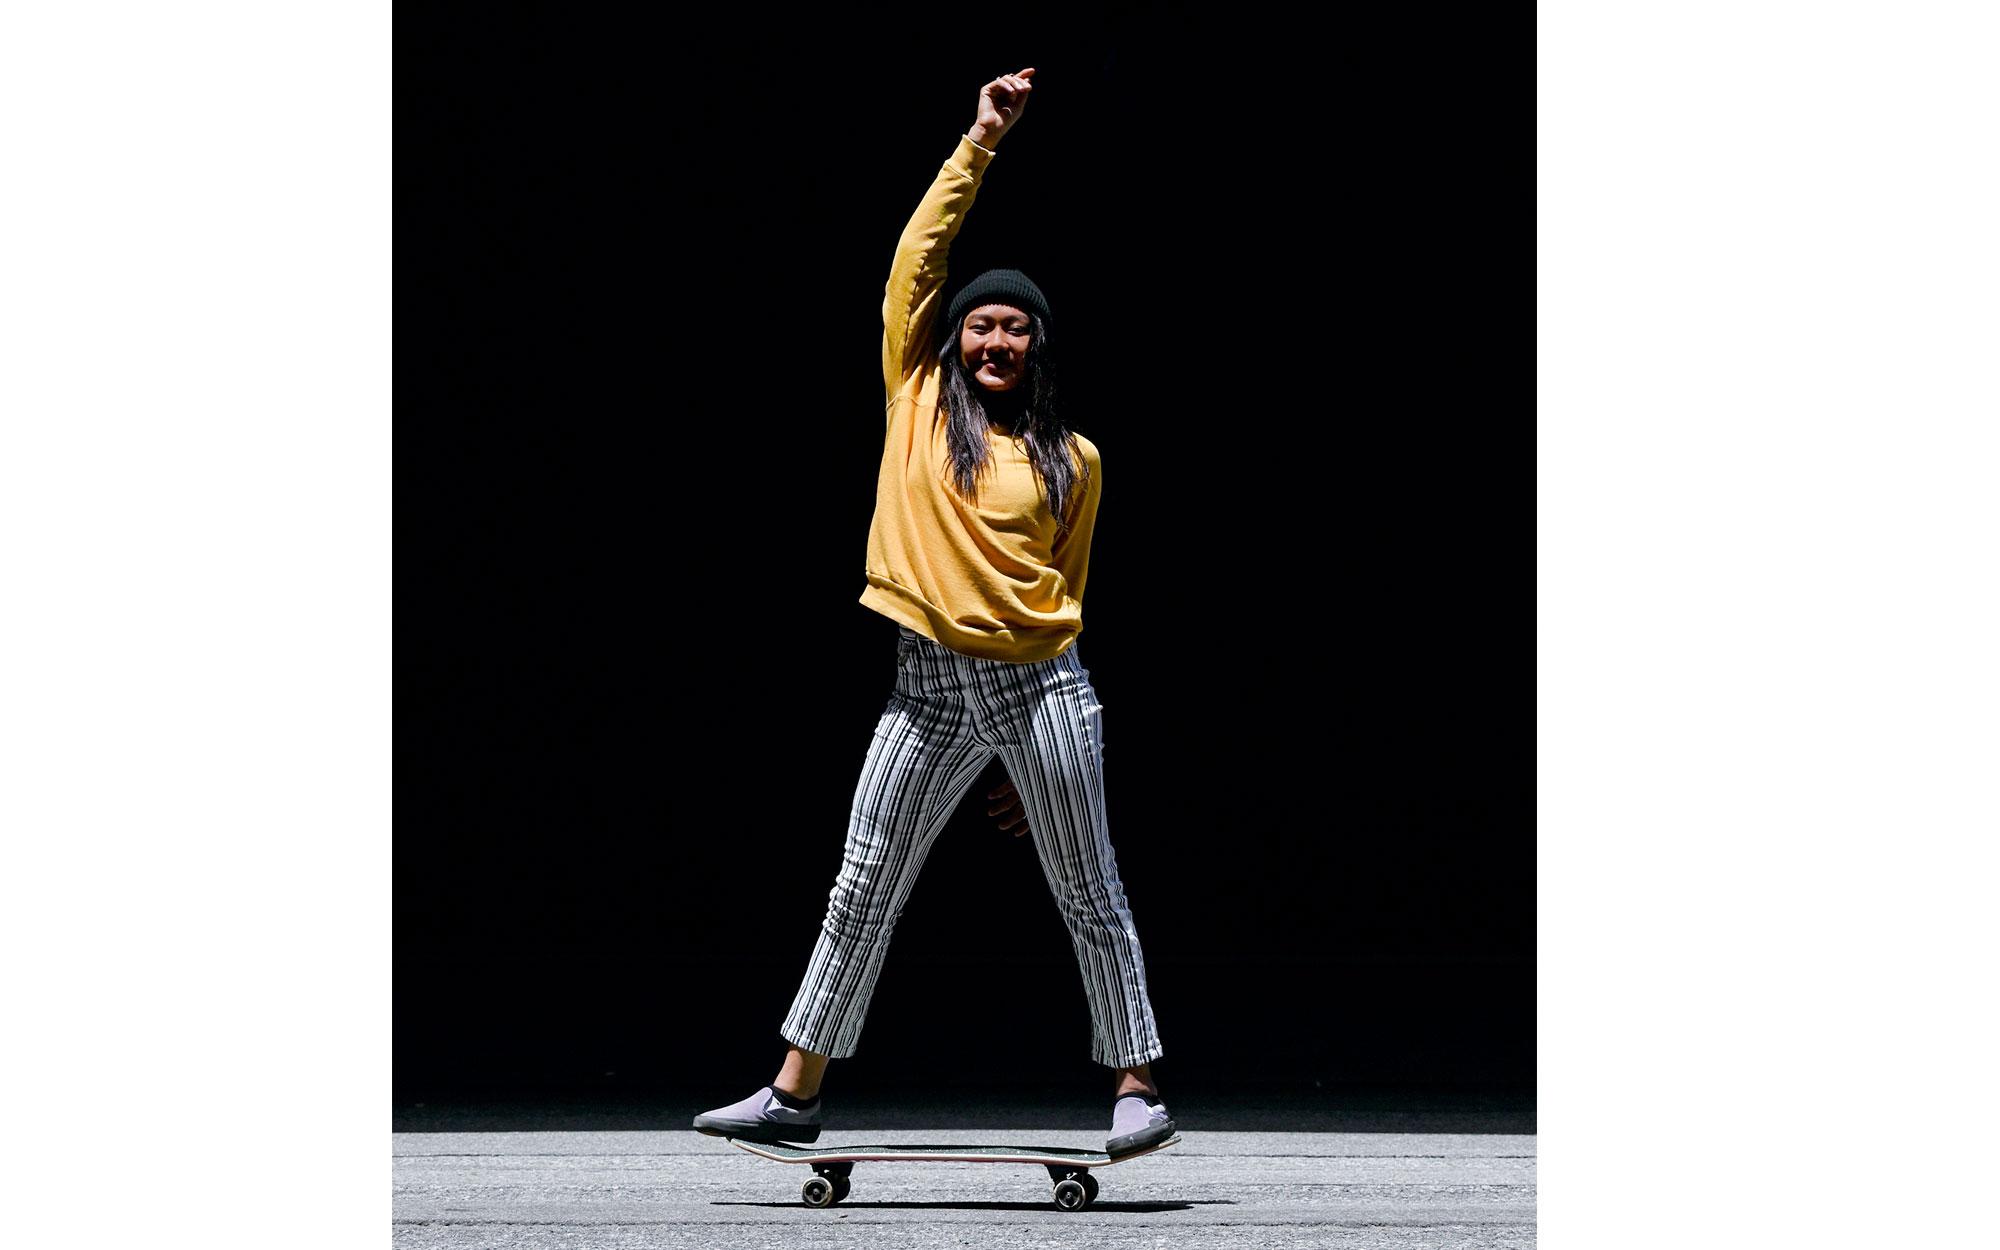 Z 50 and NIKKOR Z DX 50-250mm f/4.5-6.3 VR photo of a woman on a skateboard